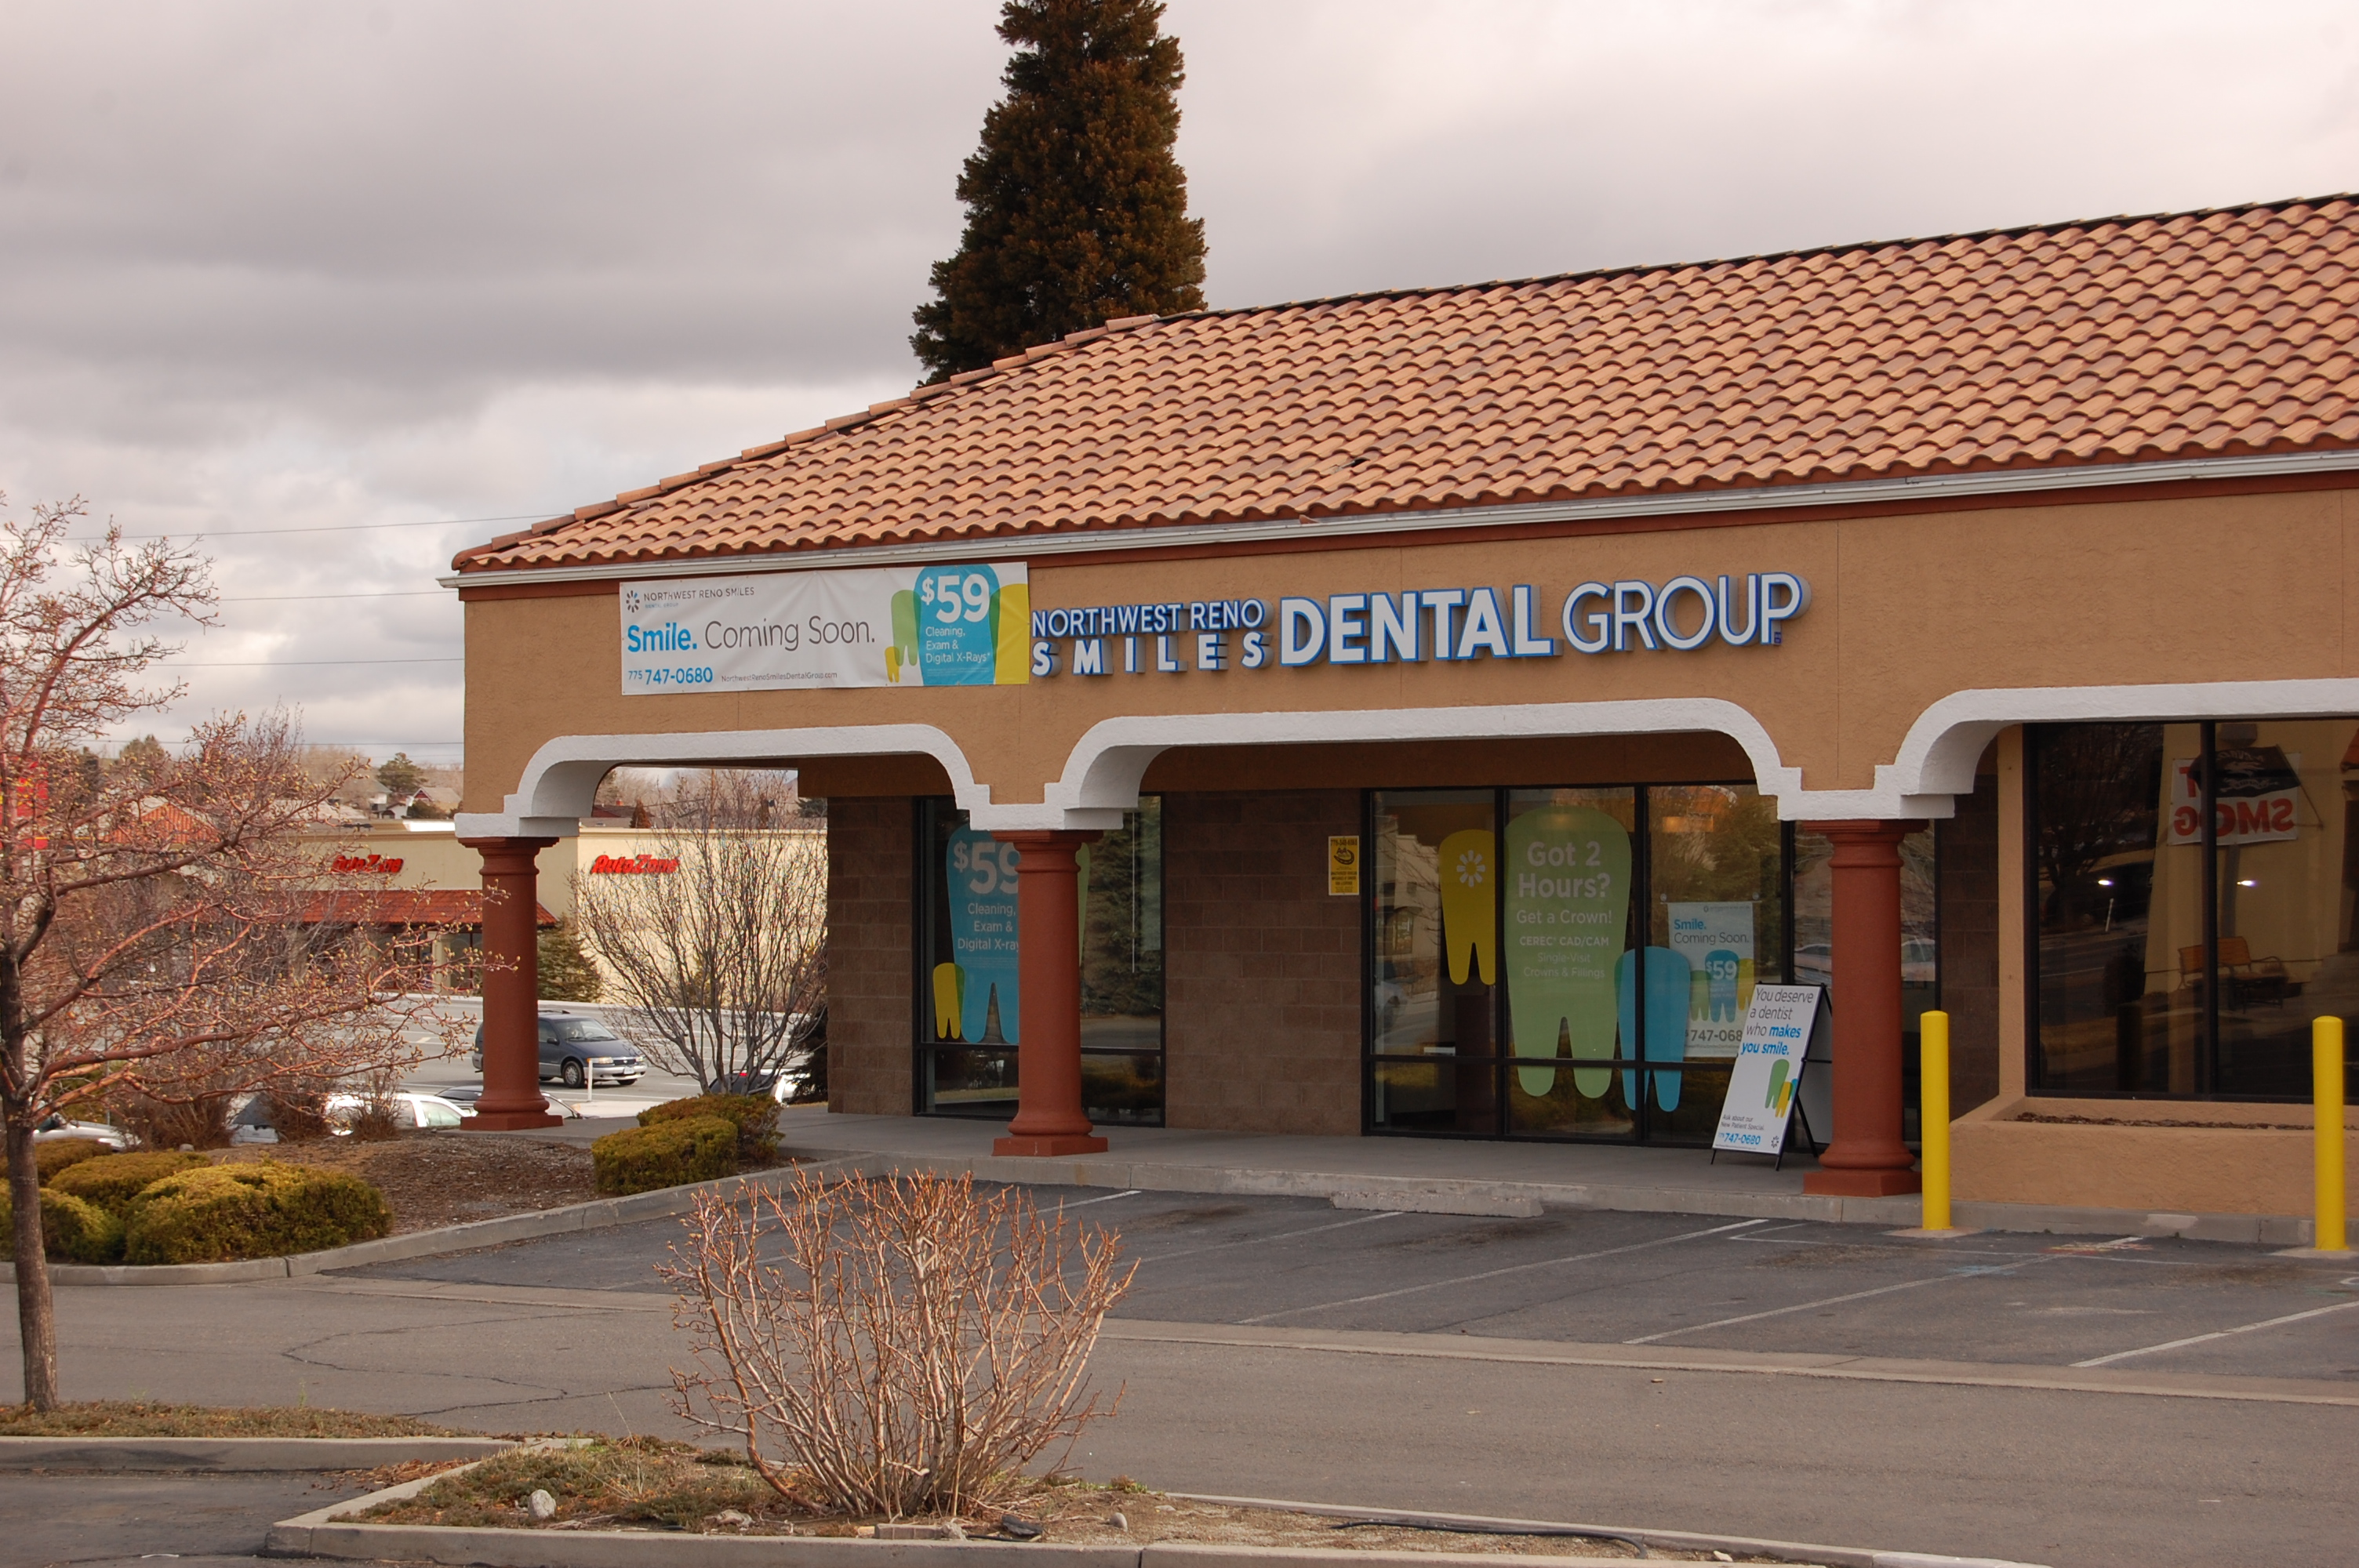 Northwest Reno Smiles Dental Group image 1